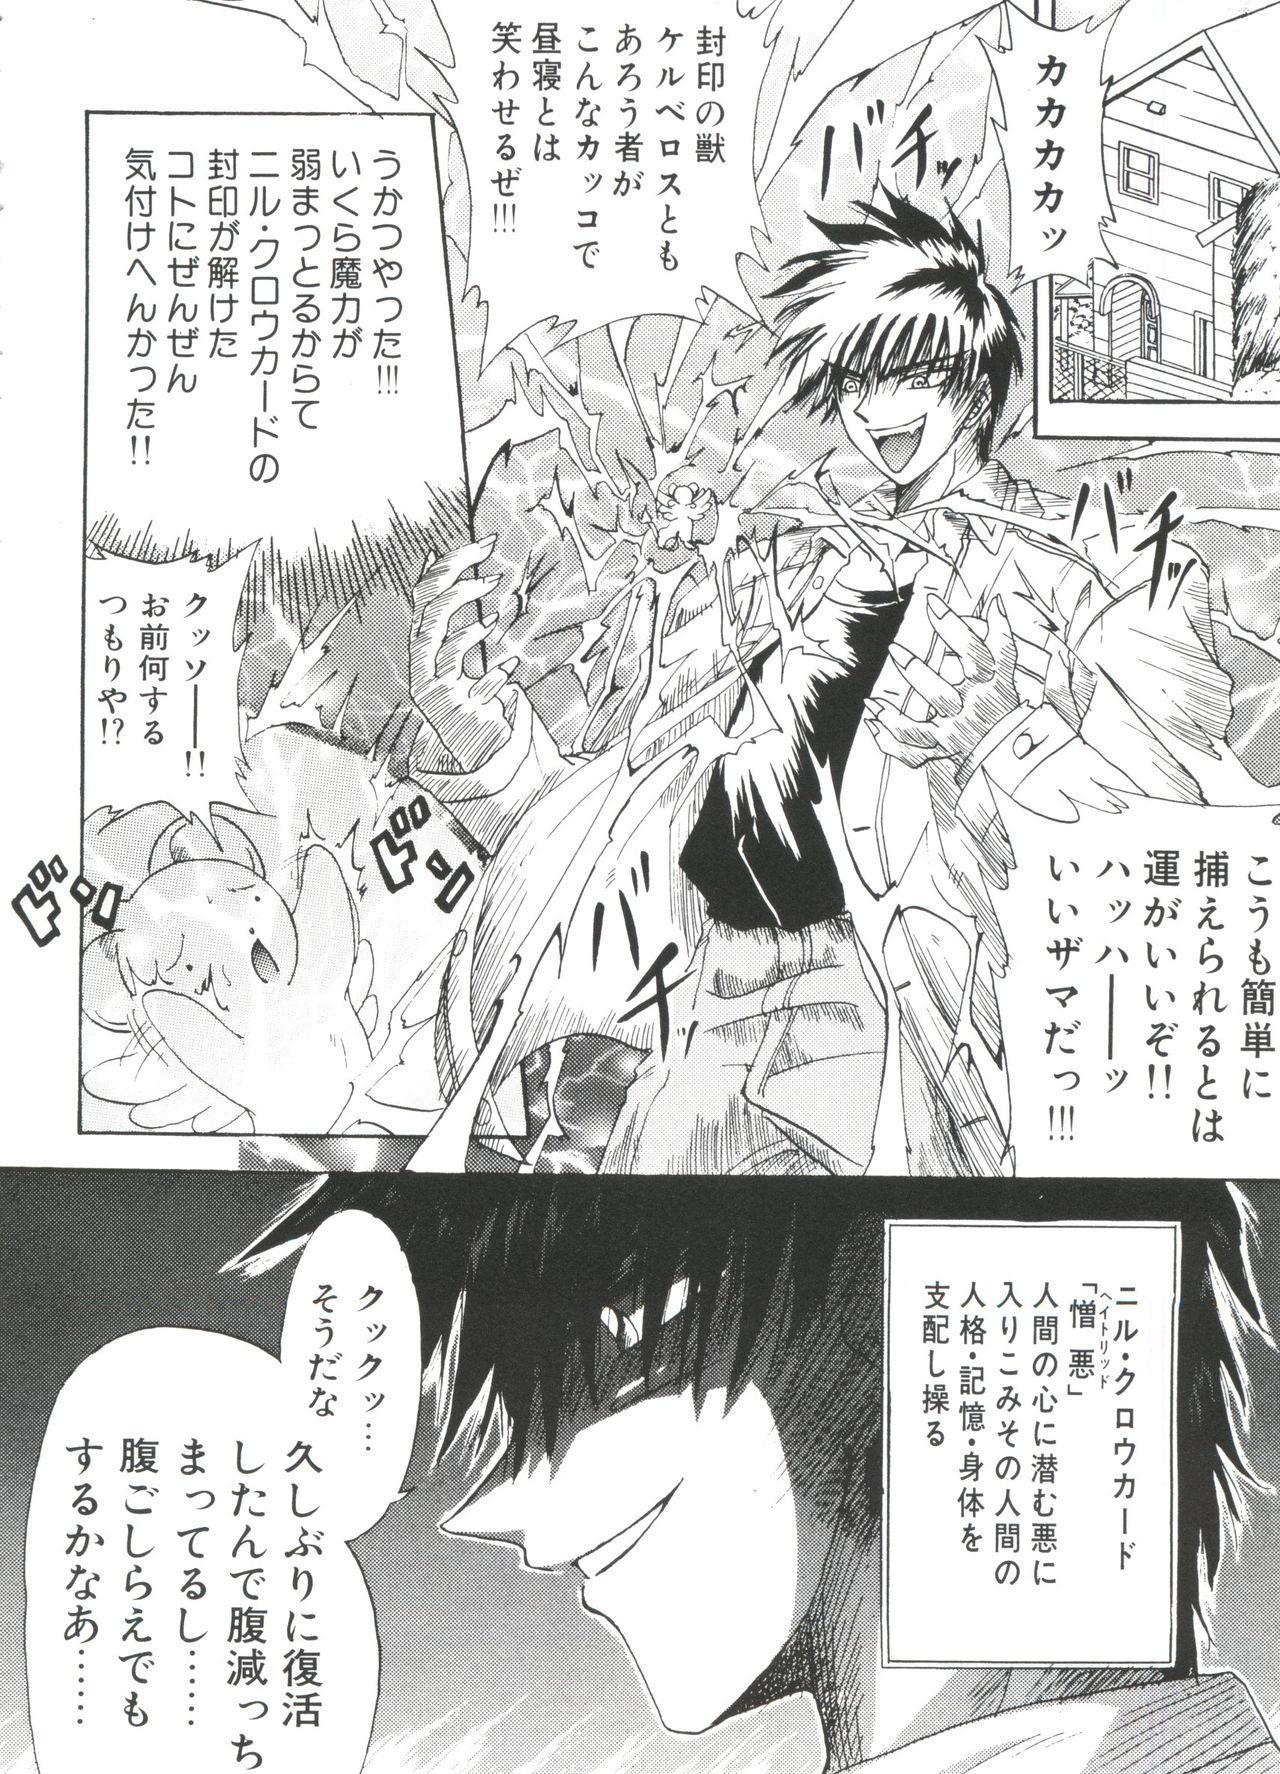 Ero-chan to Issho 2 103